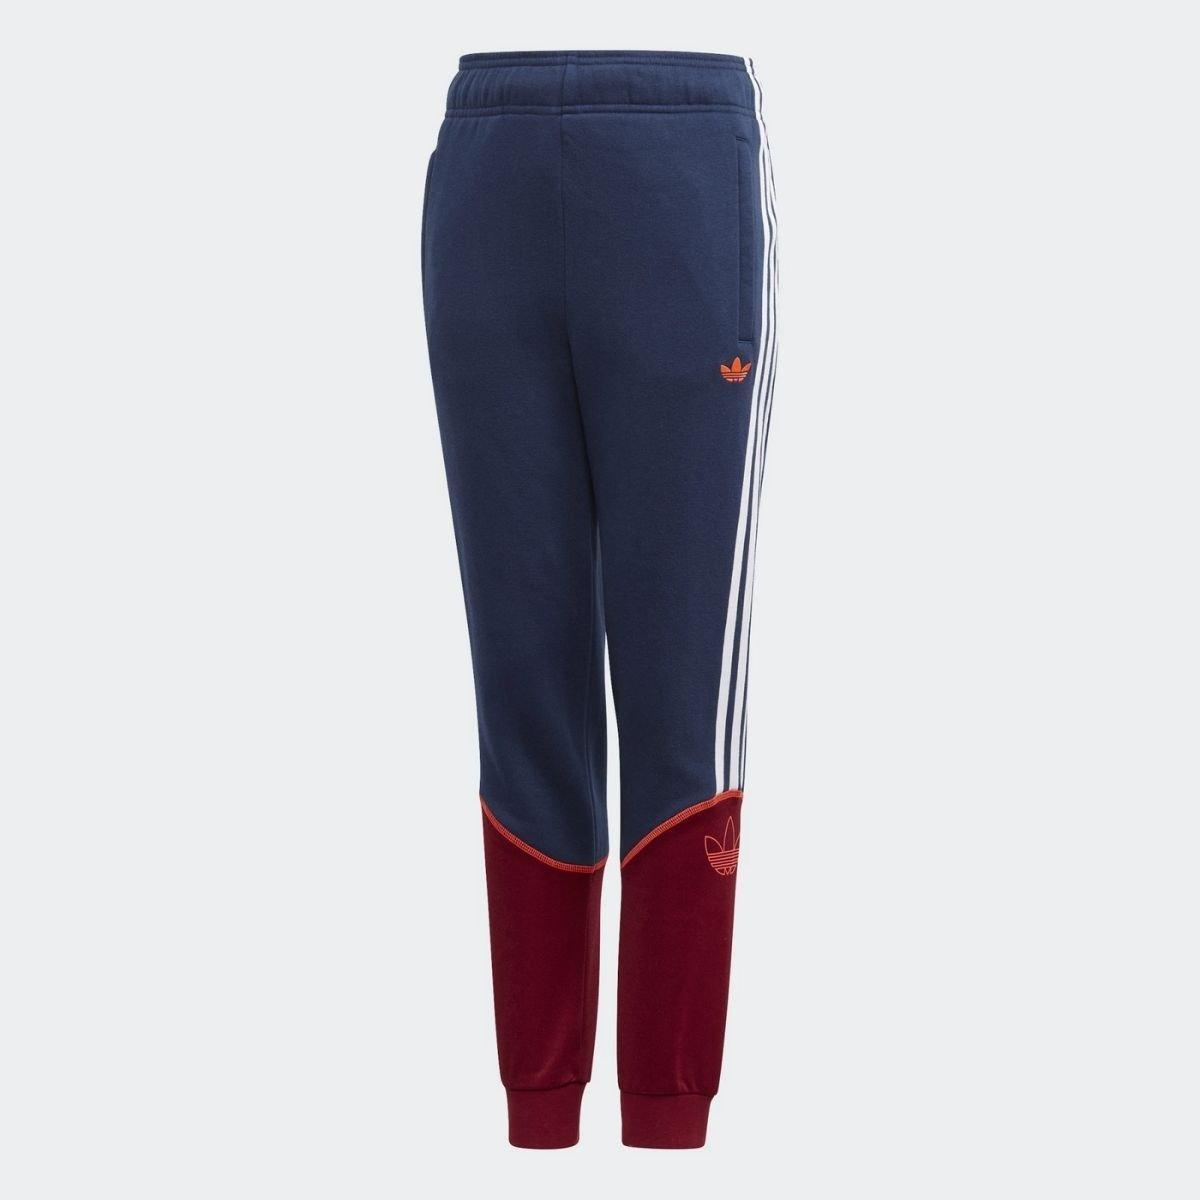 Pantalone Adidas Outline...